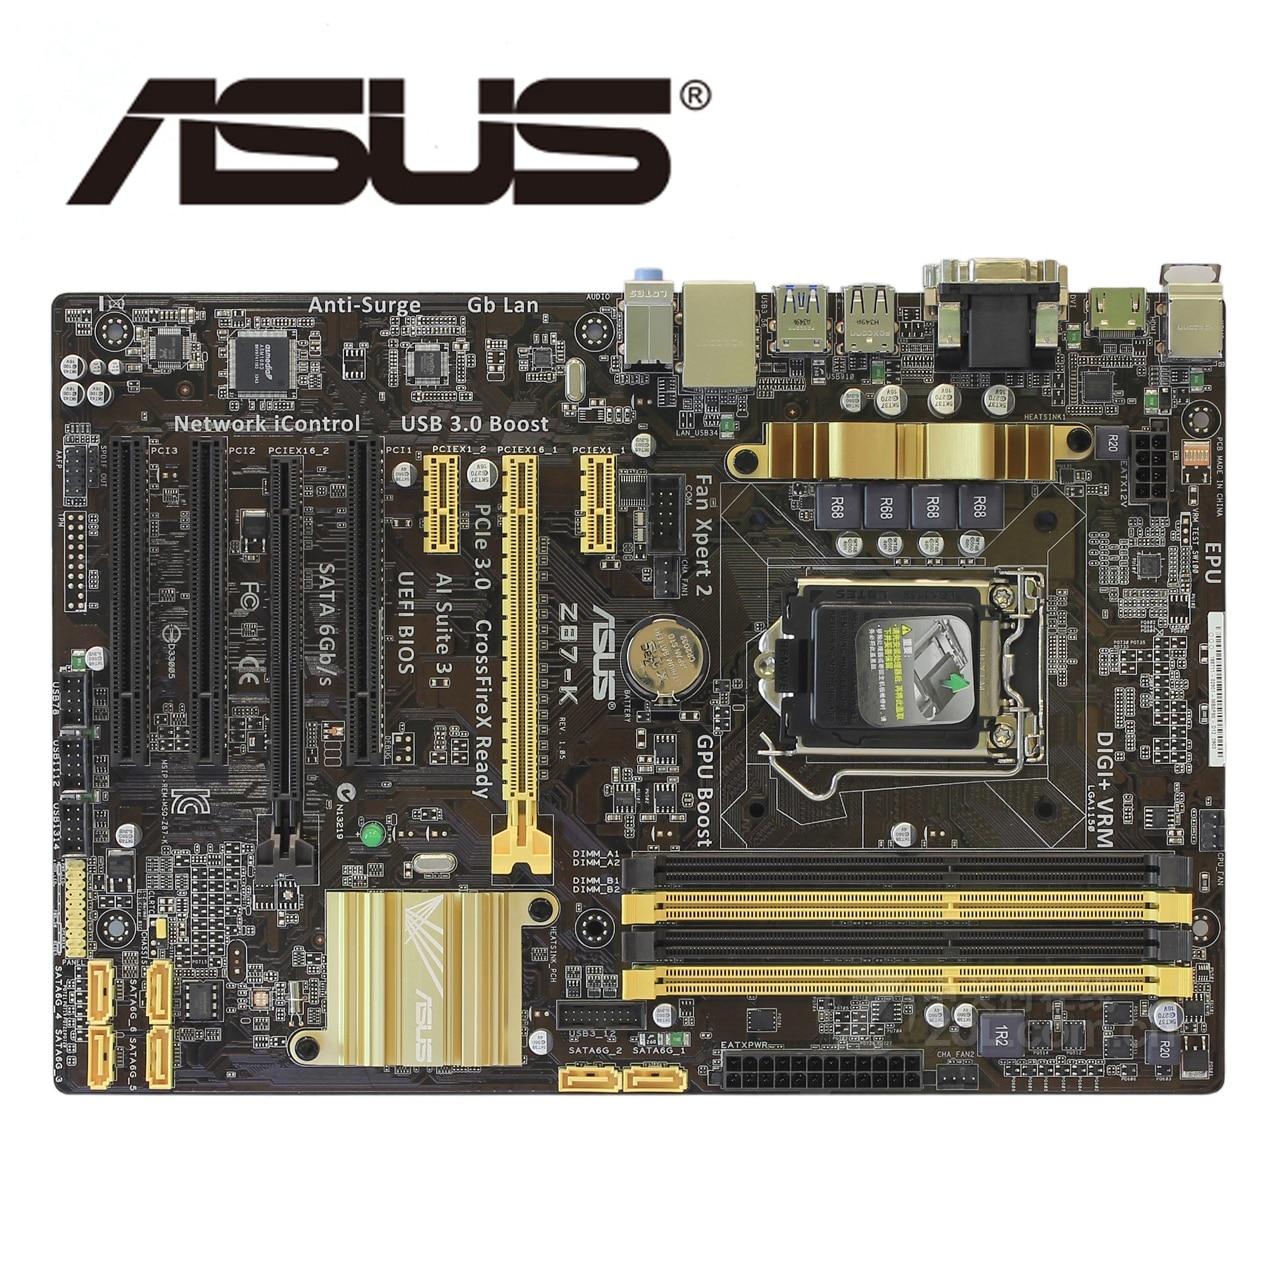 LGA1150 DDR3 Z87 Para ASUS Z87K Motherboard32G Z87-k 100% Original Mainboard Desktop placa Mãe USB3.0 SATA III VGA OC Usado